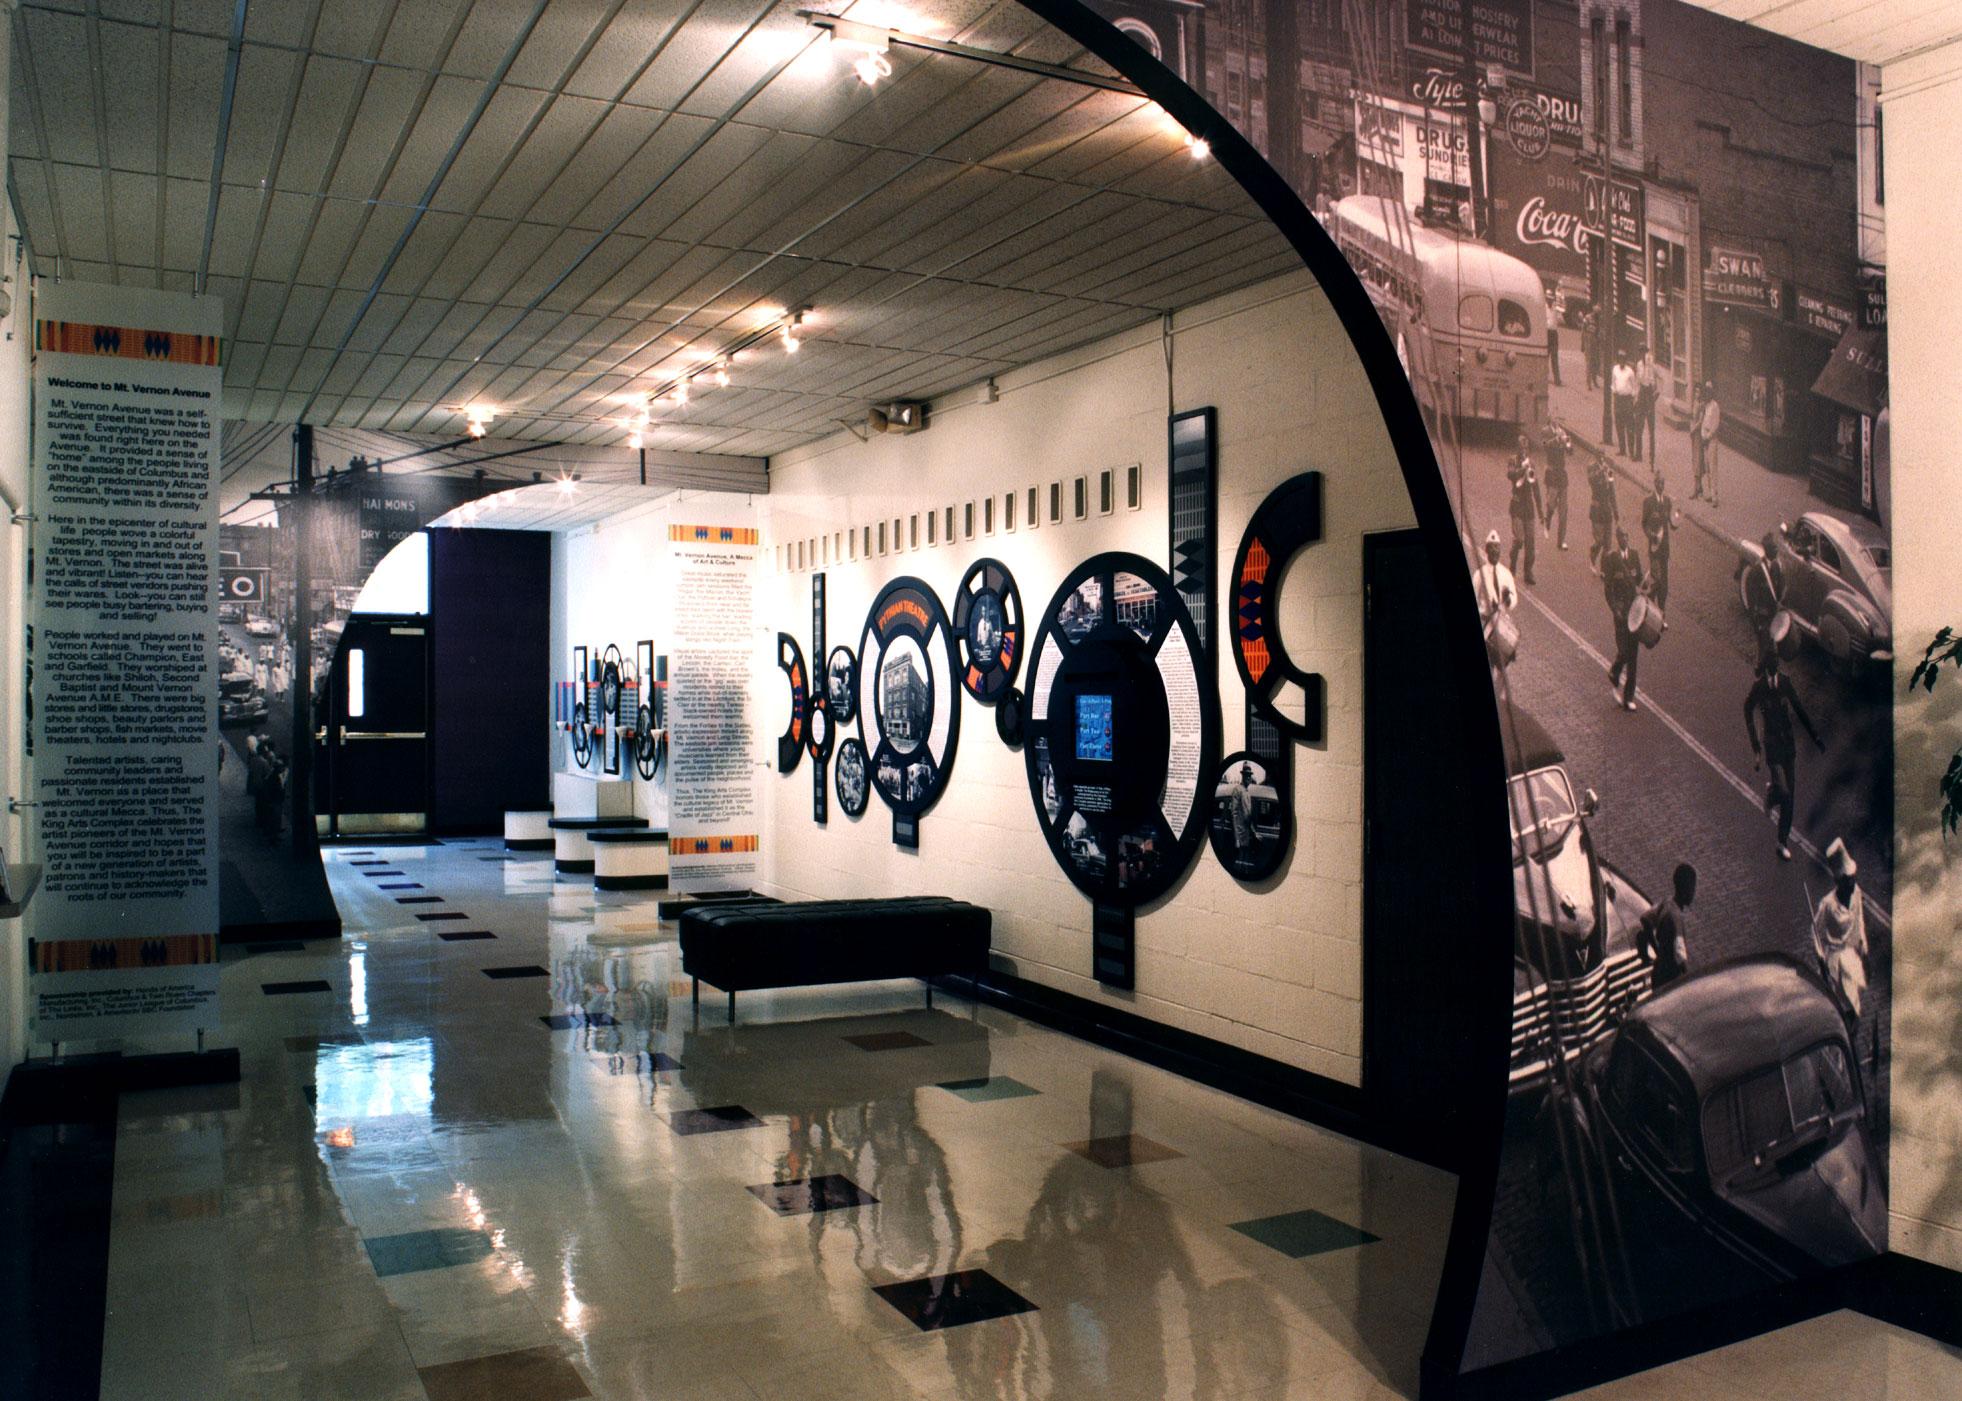 King Arts Complex Hallway Displays